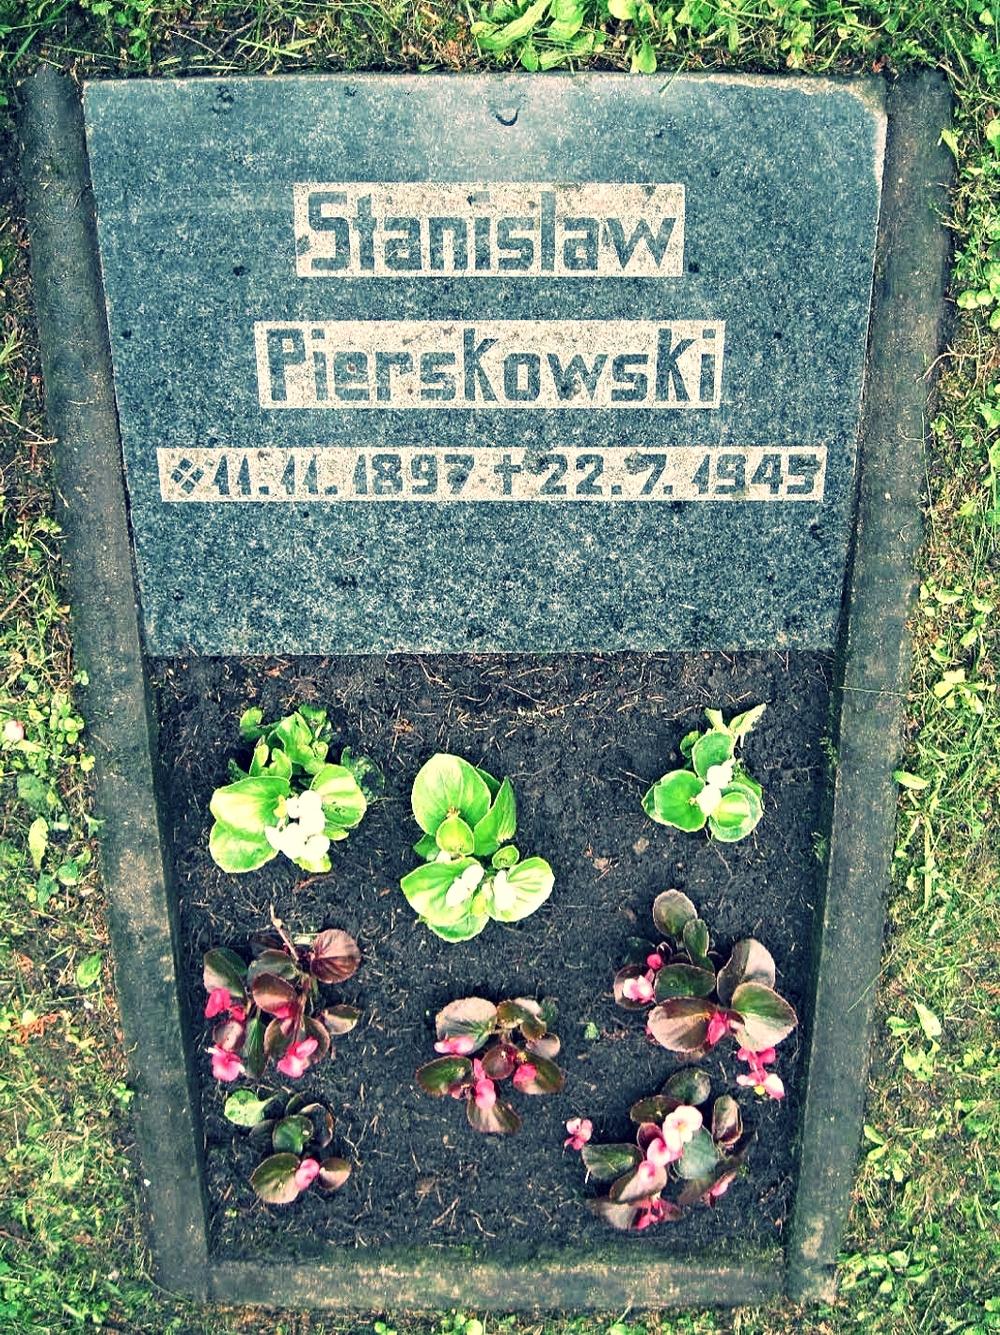 Mike Piorkowski's father's gravesite